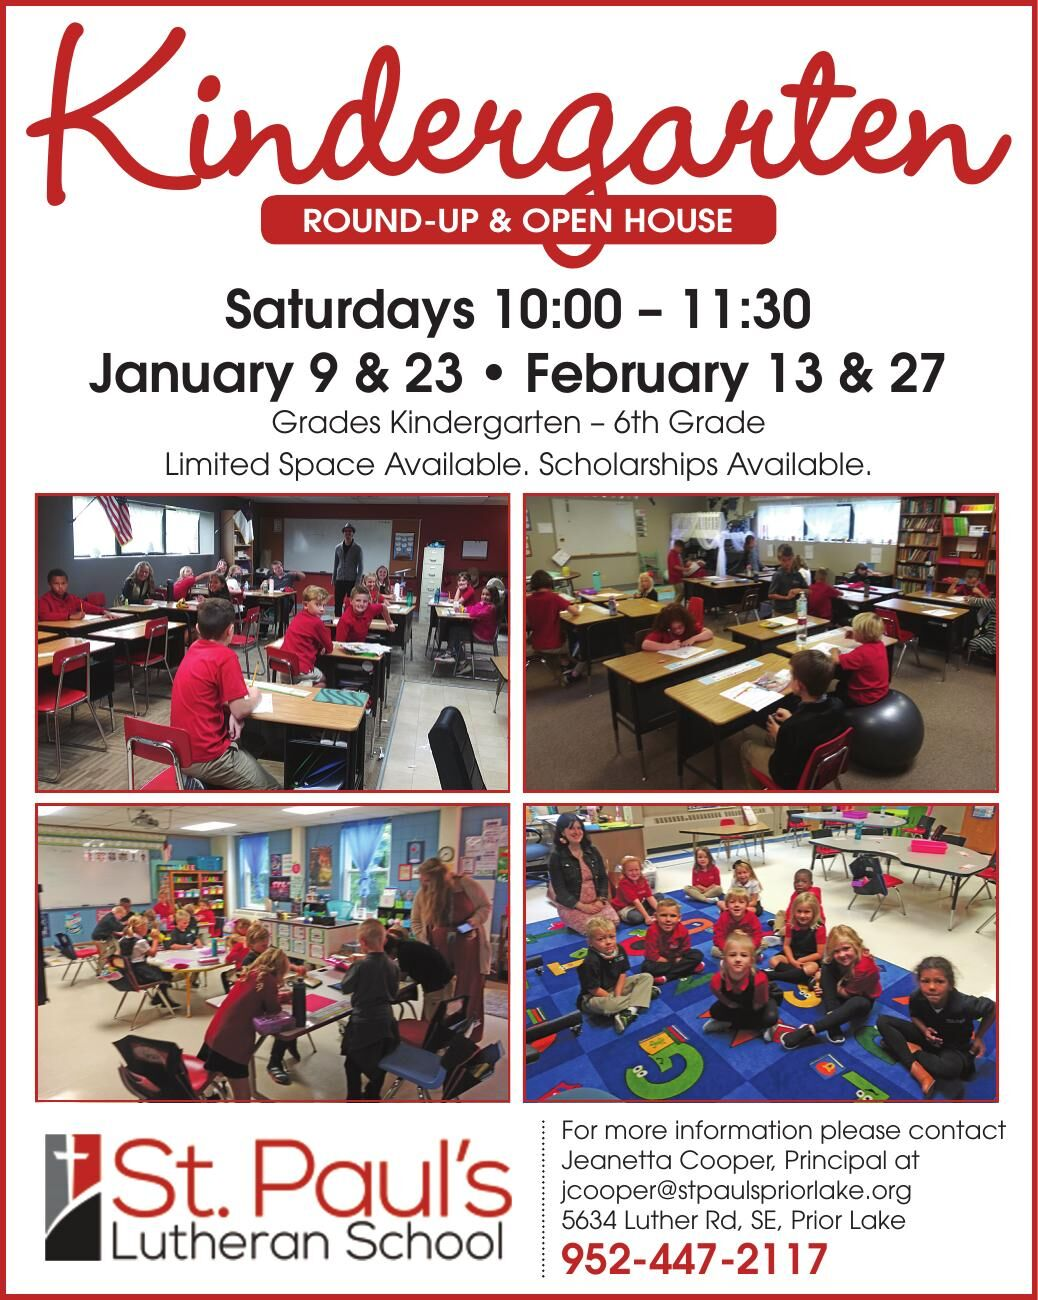 Kindergarten Round-up & open HouSe